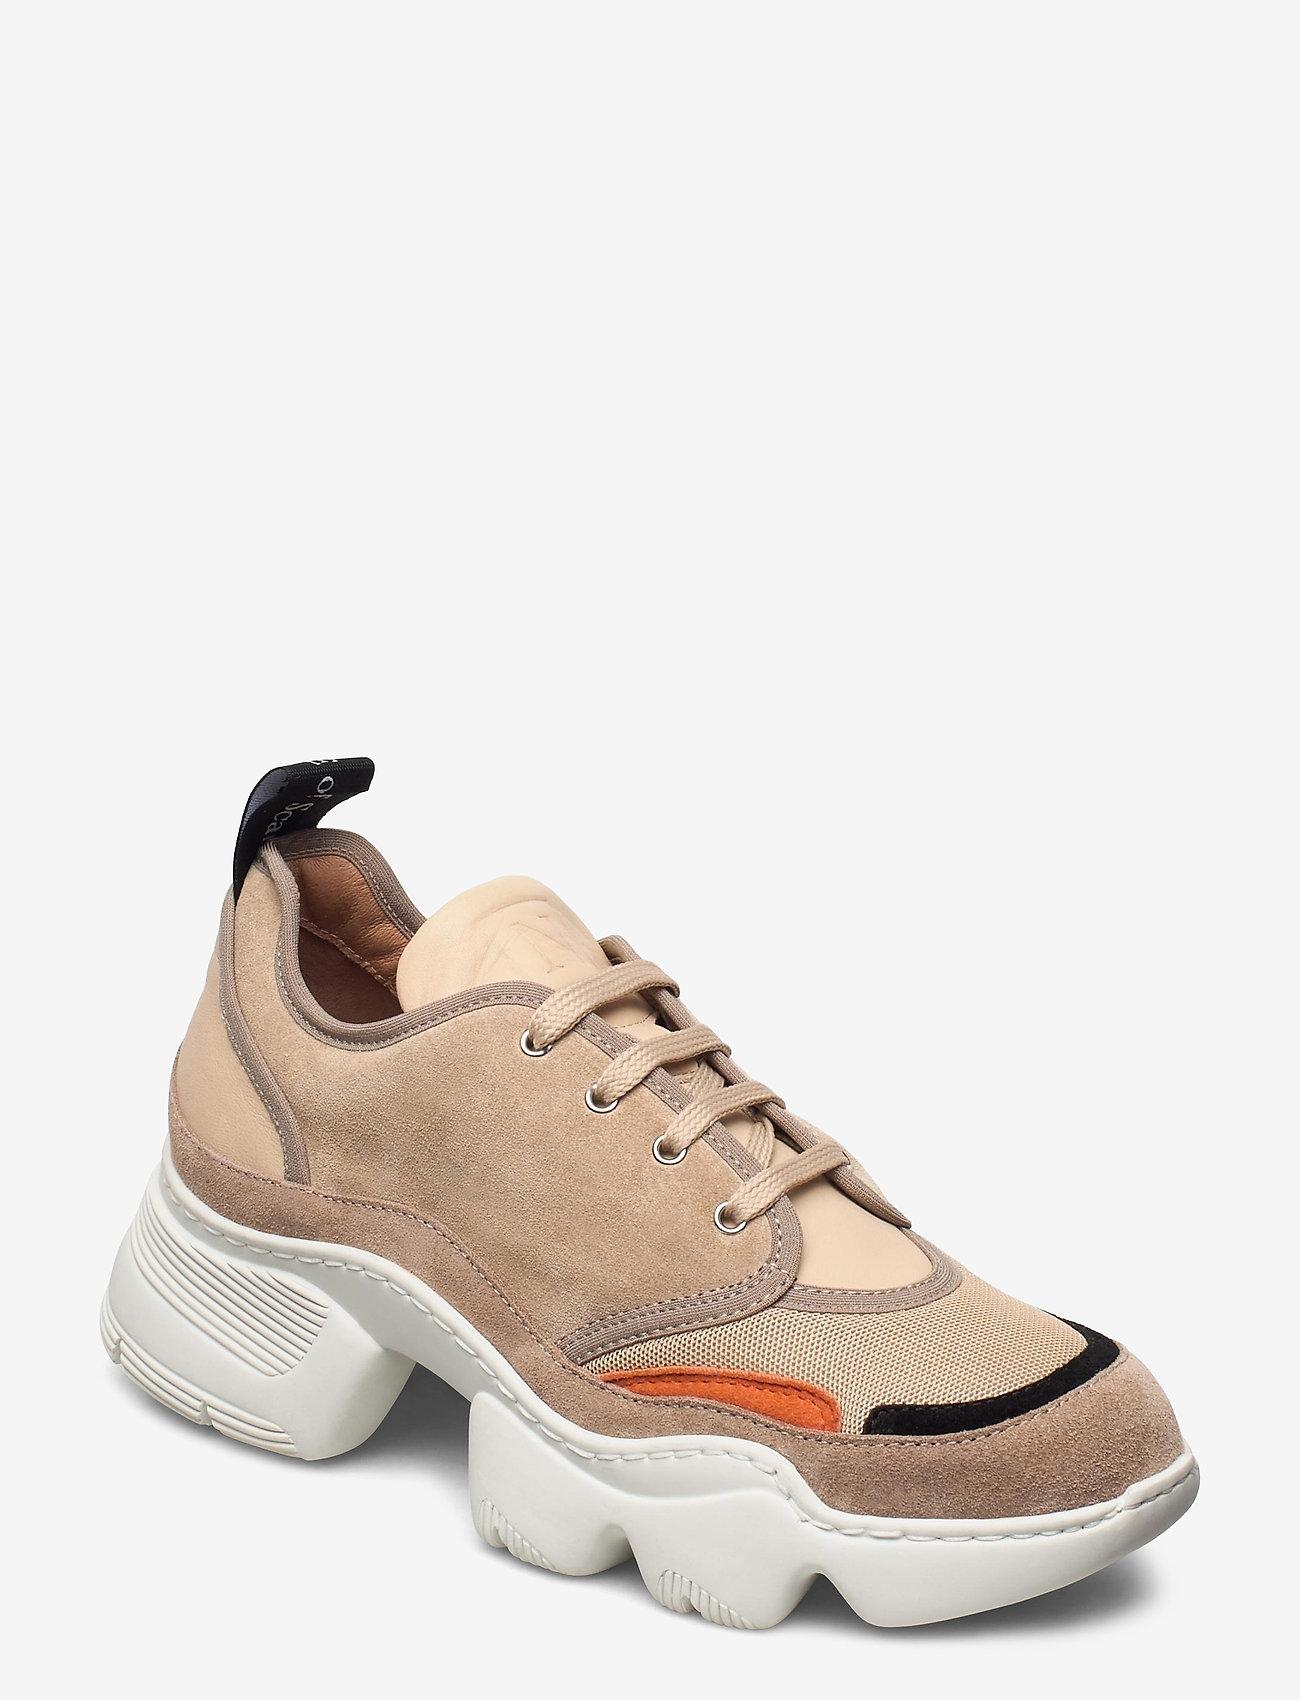 Nude of Scandinavia - SIBYL - chunky sneakers - mix / beige - 0